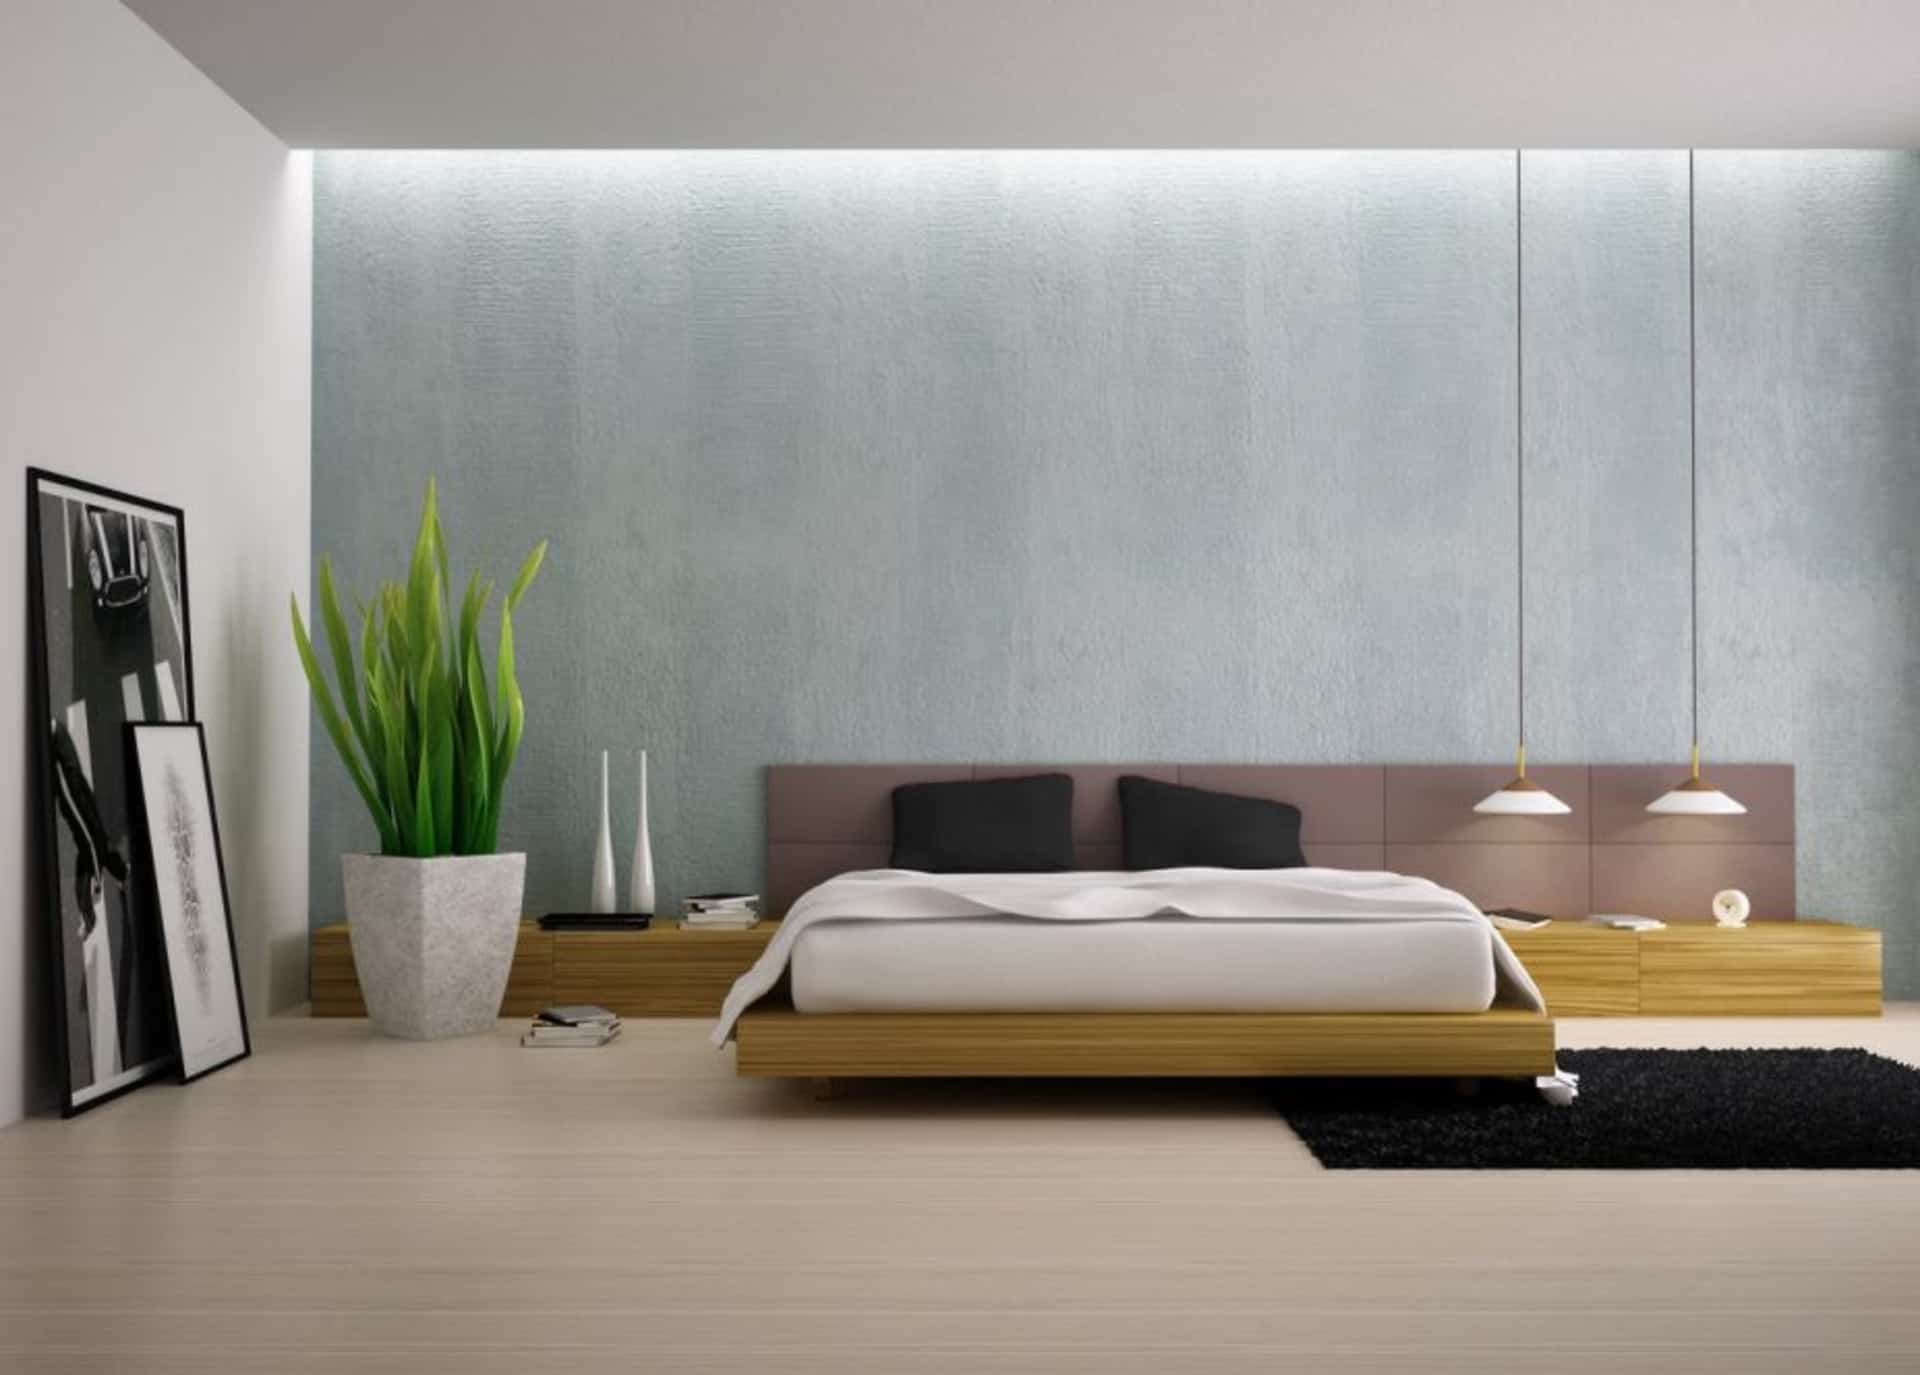 extraordinary-cool-modern-beds-bedroom-viewdecor-plus-appealing-cool-modern-beds-new-bedroom-picture-cool-beds